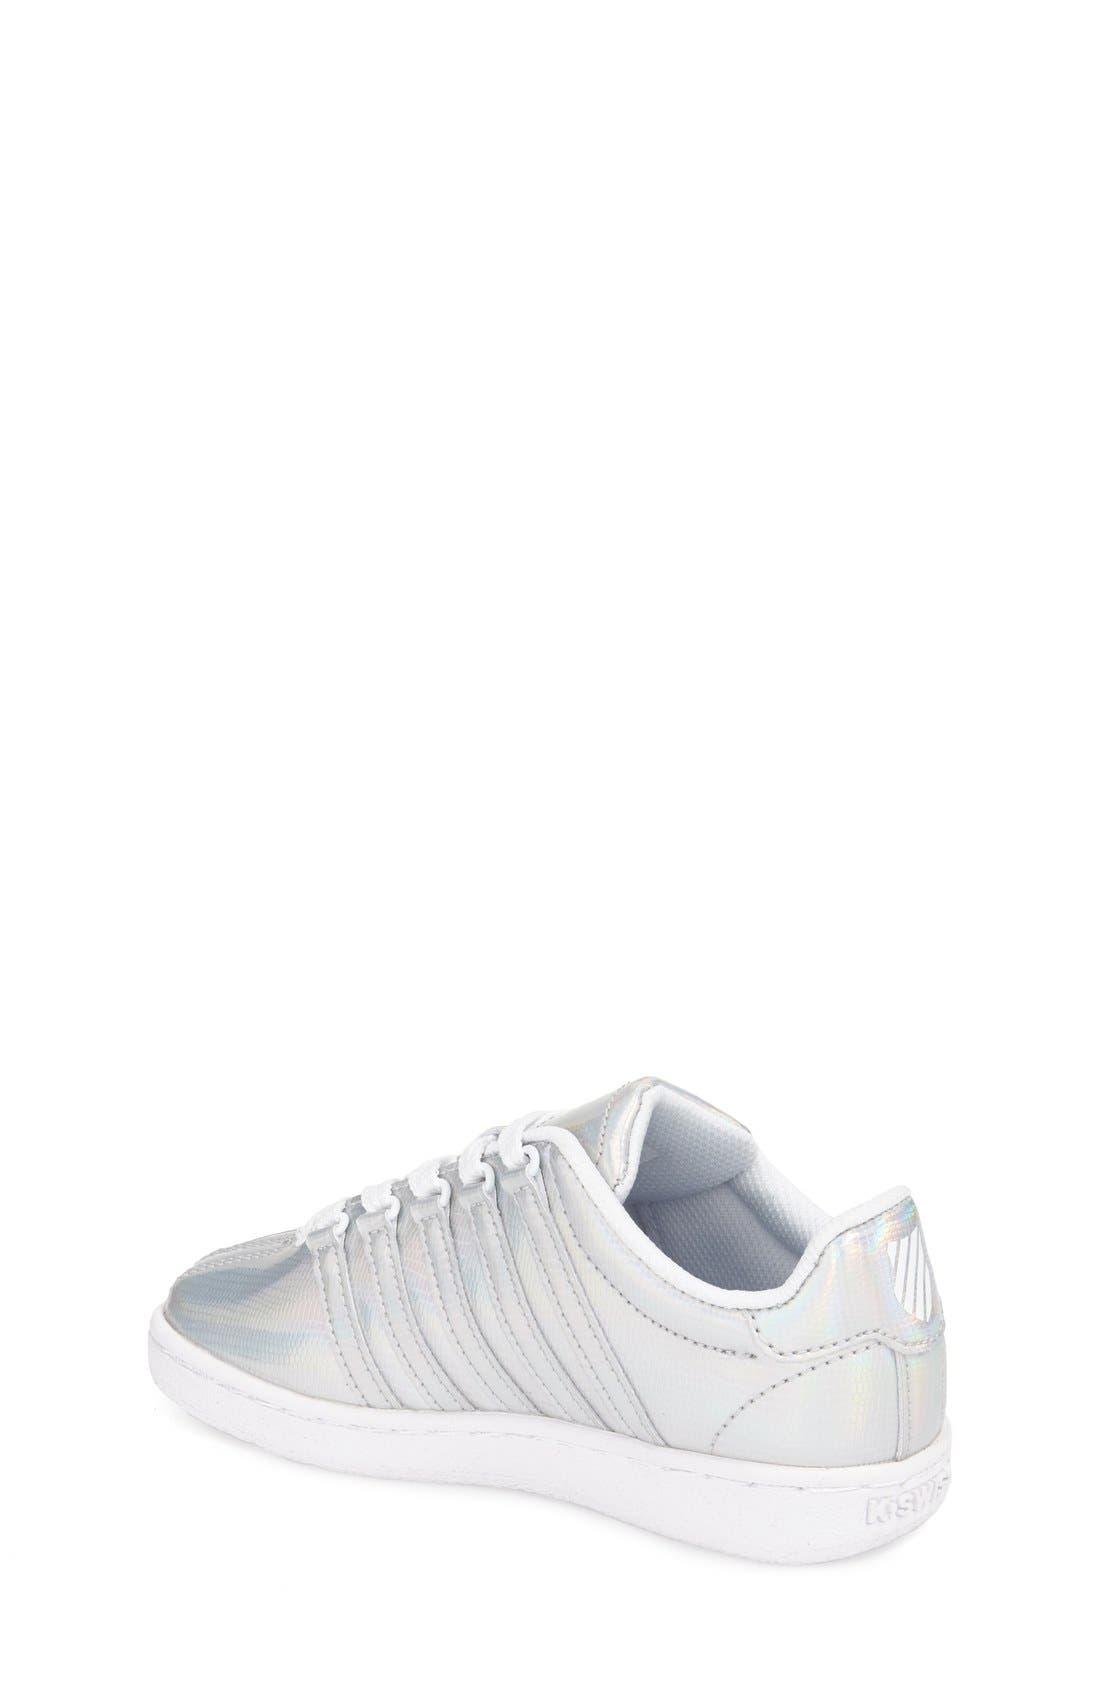 'Classic - Shine On' Sneaker,                             Alternate thumbnail 2, color,                             086